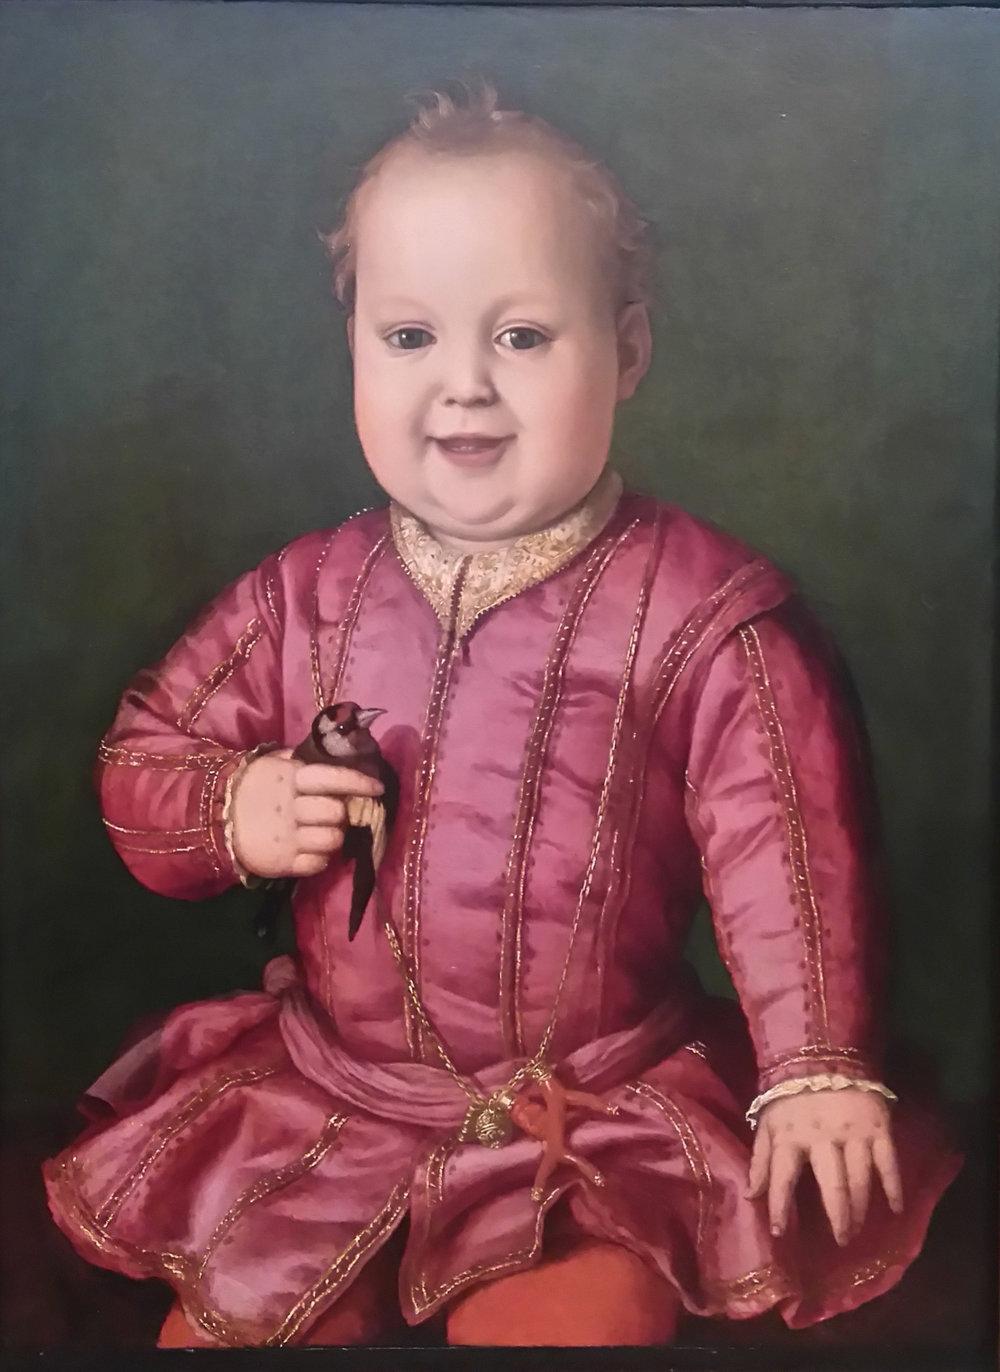 Baby Cosimo with bird